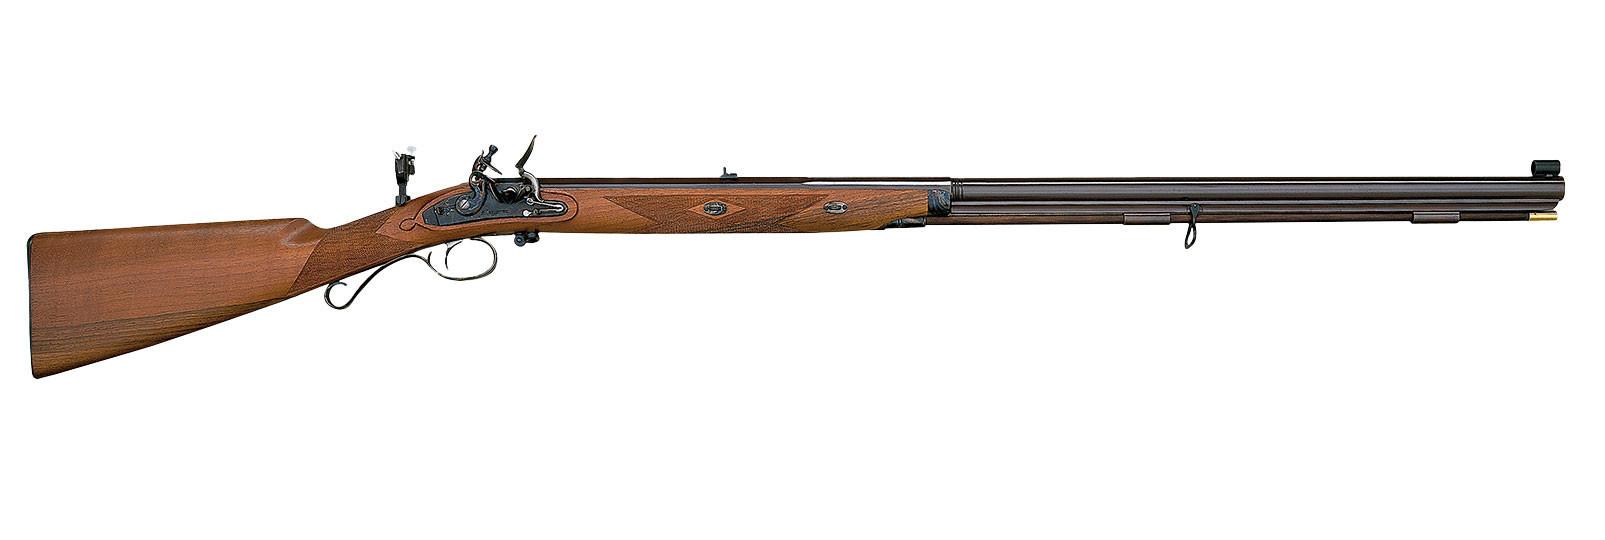 Mortimer Target Rifle flintlock model